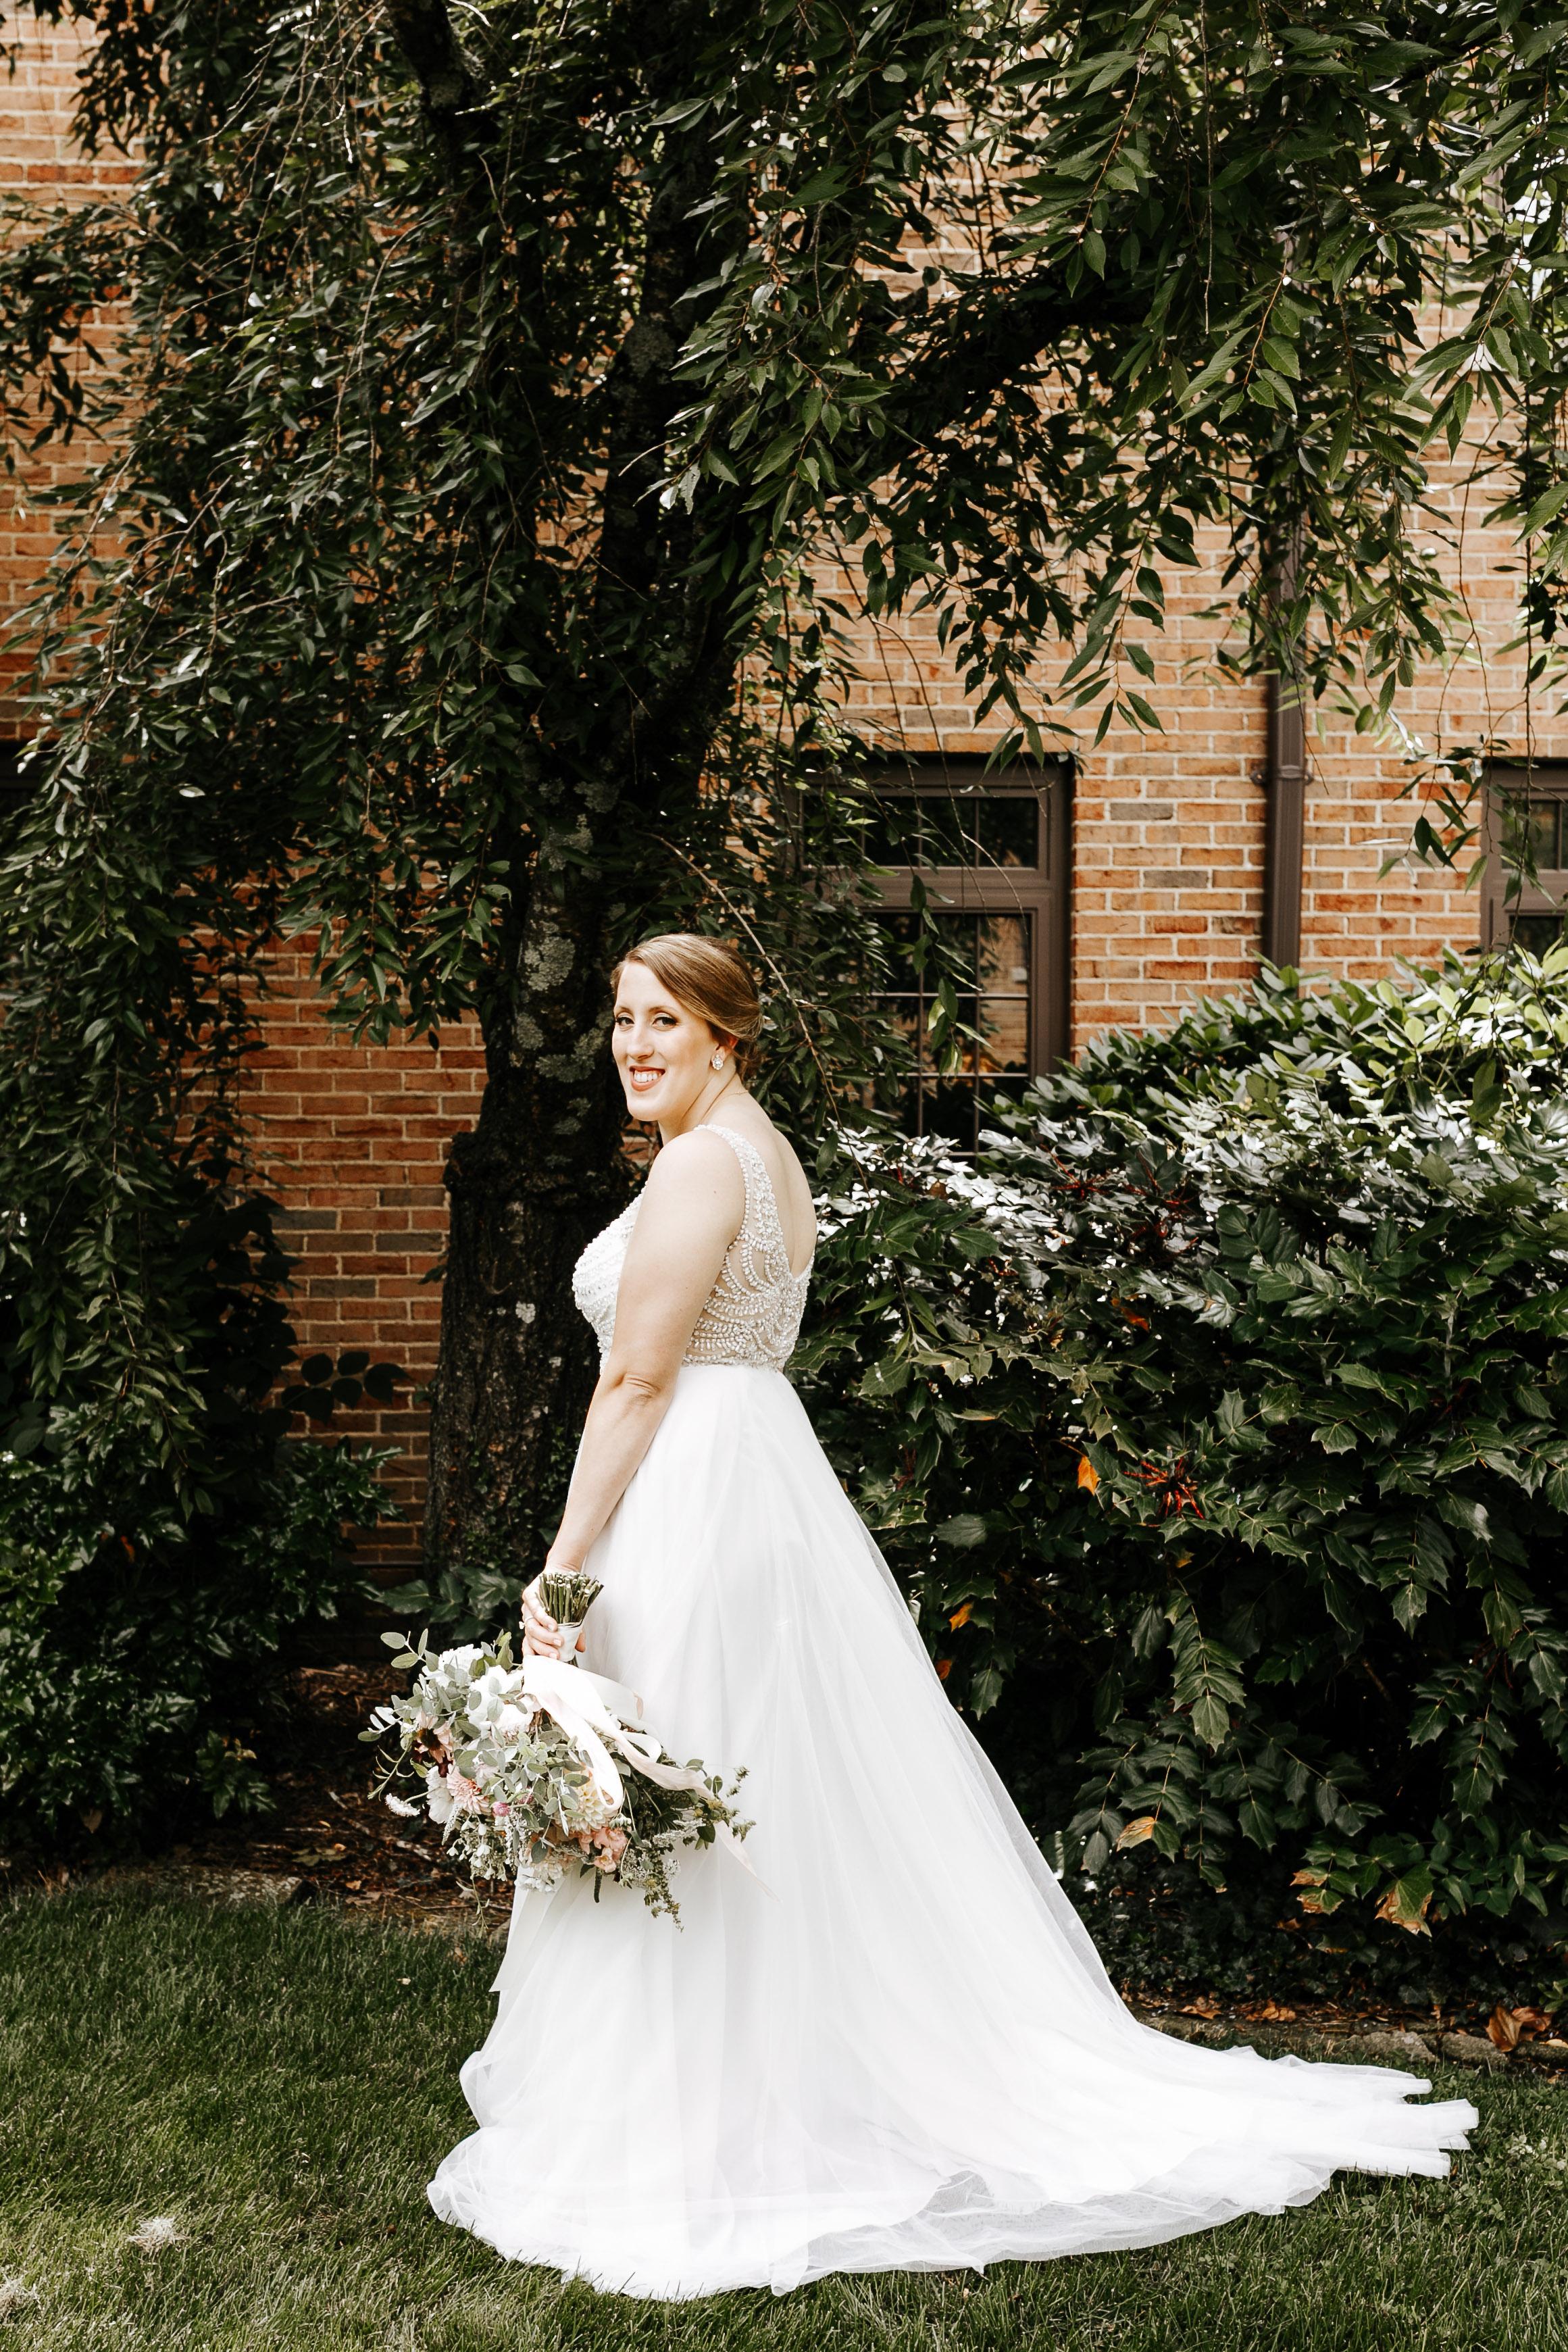 bohemian-photographer-wedding-tennessee-16.jpg